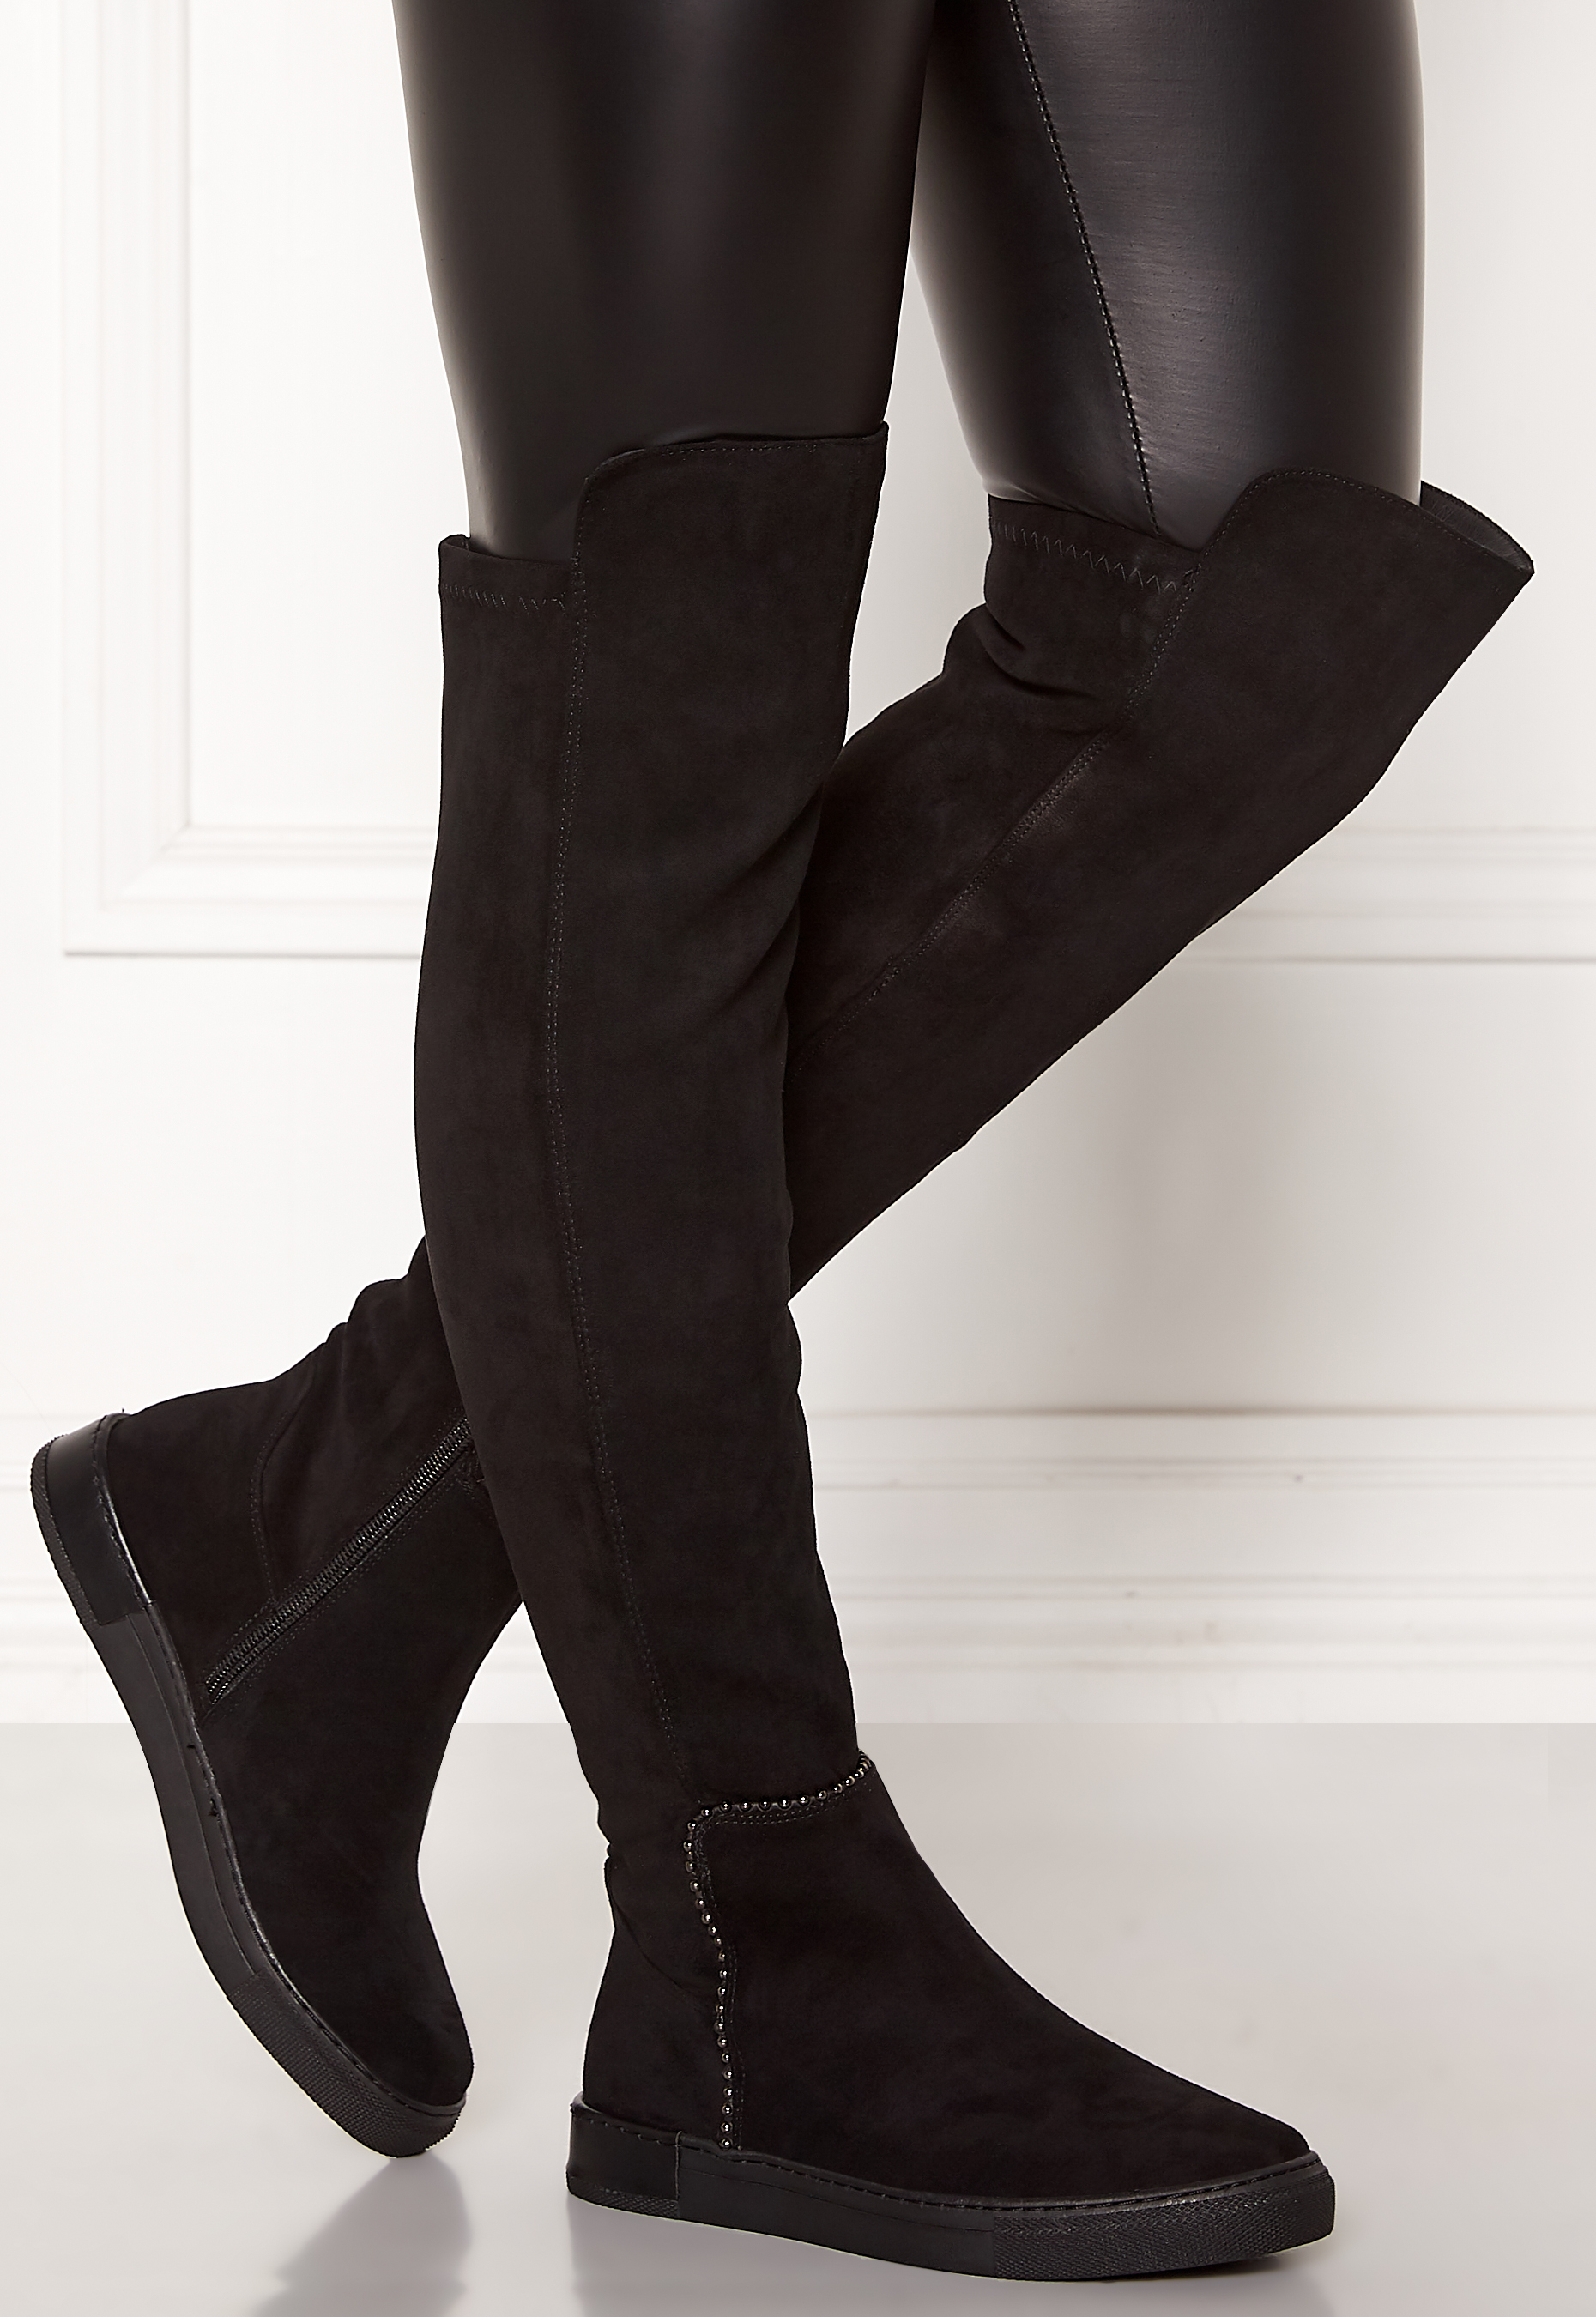 francesco-milano-overknee-low-boots-nero_1.jpg